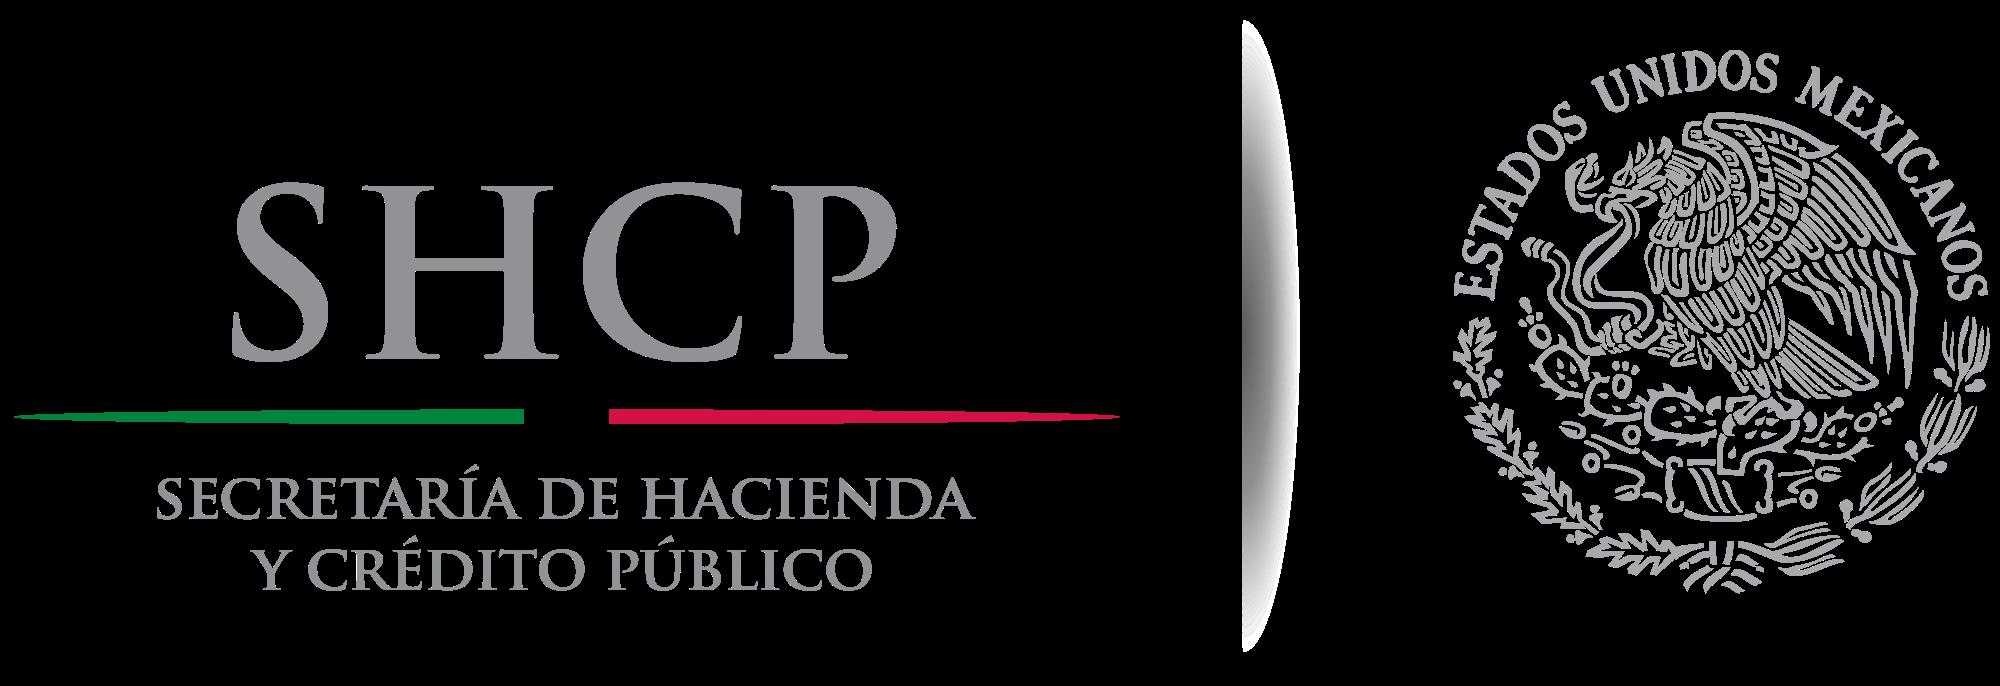 SHCP_logo_2012.png